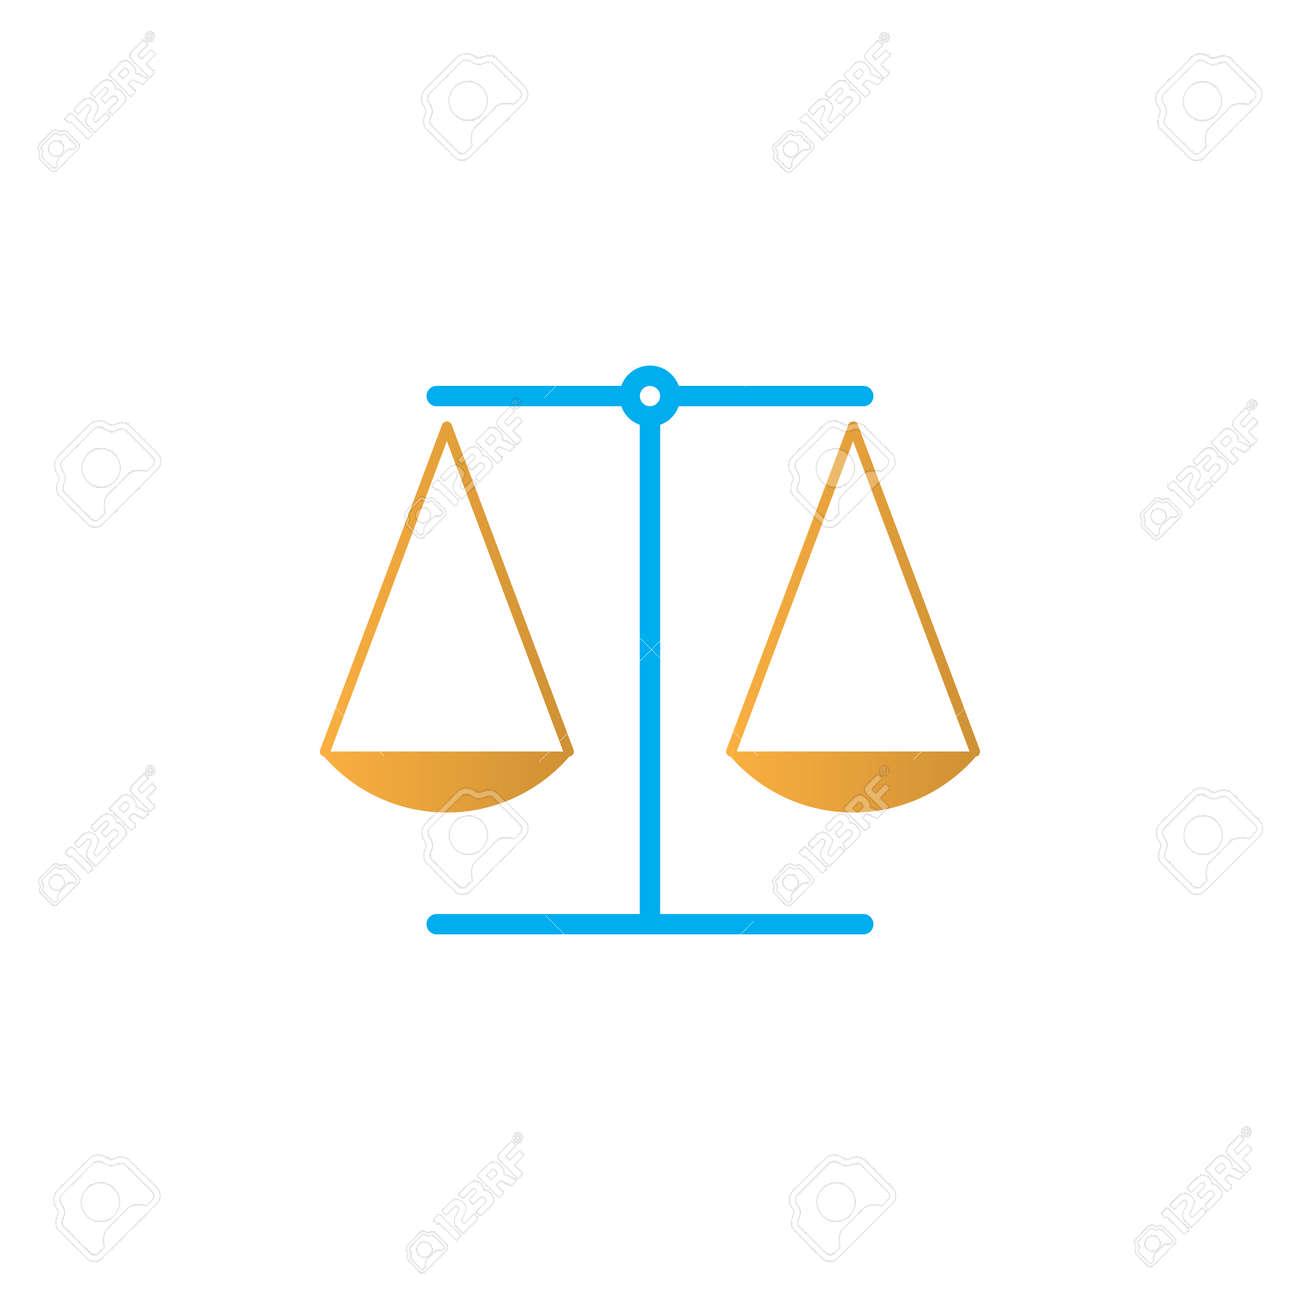 law symbol scales icon vector libra solid logo illustration rh 123rf com libre login libera login